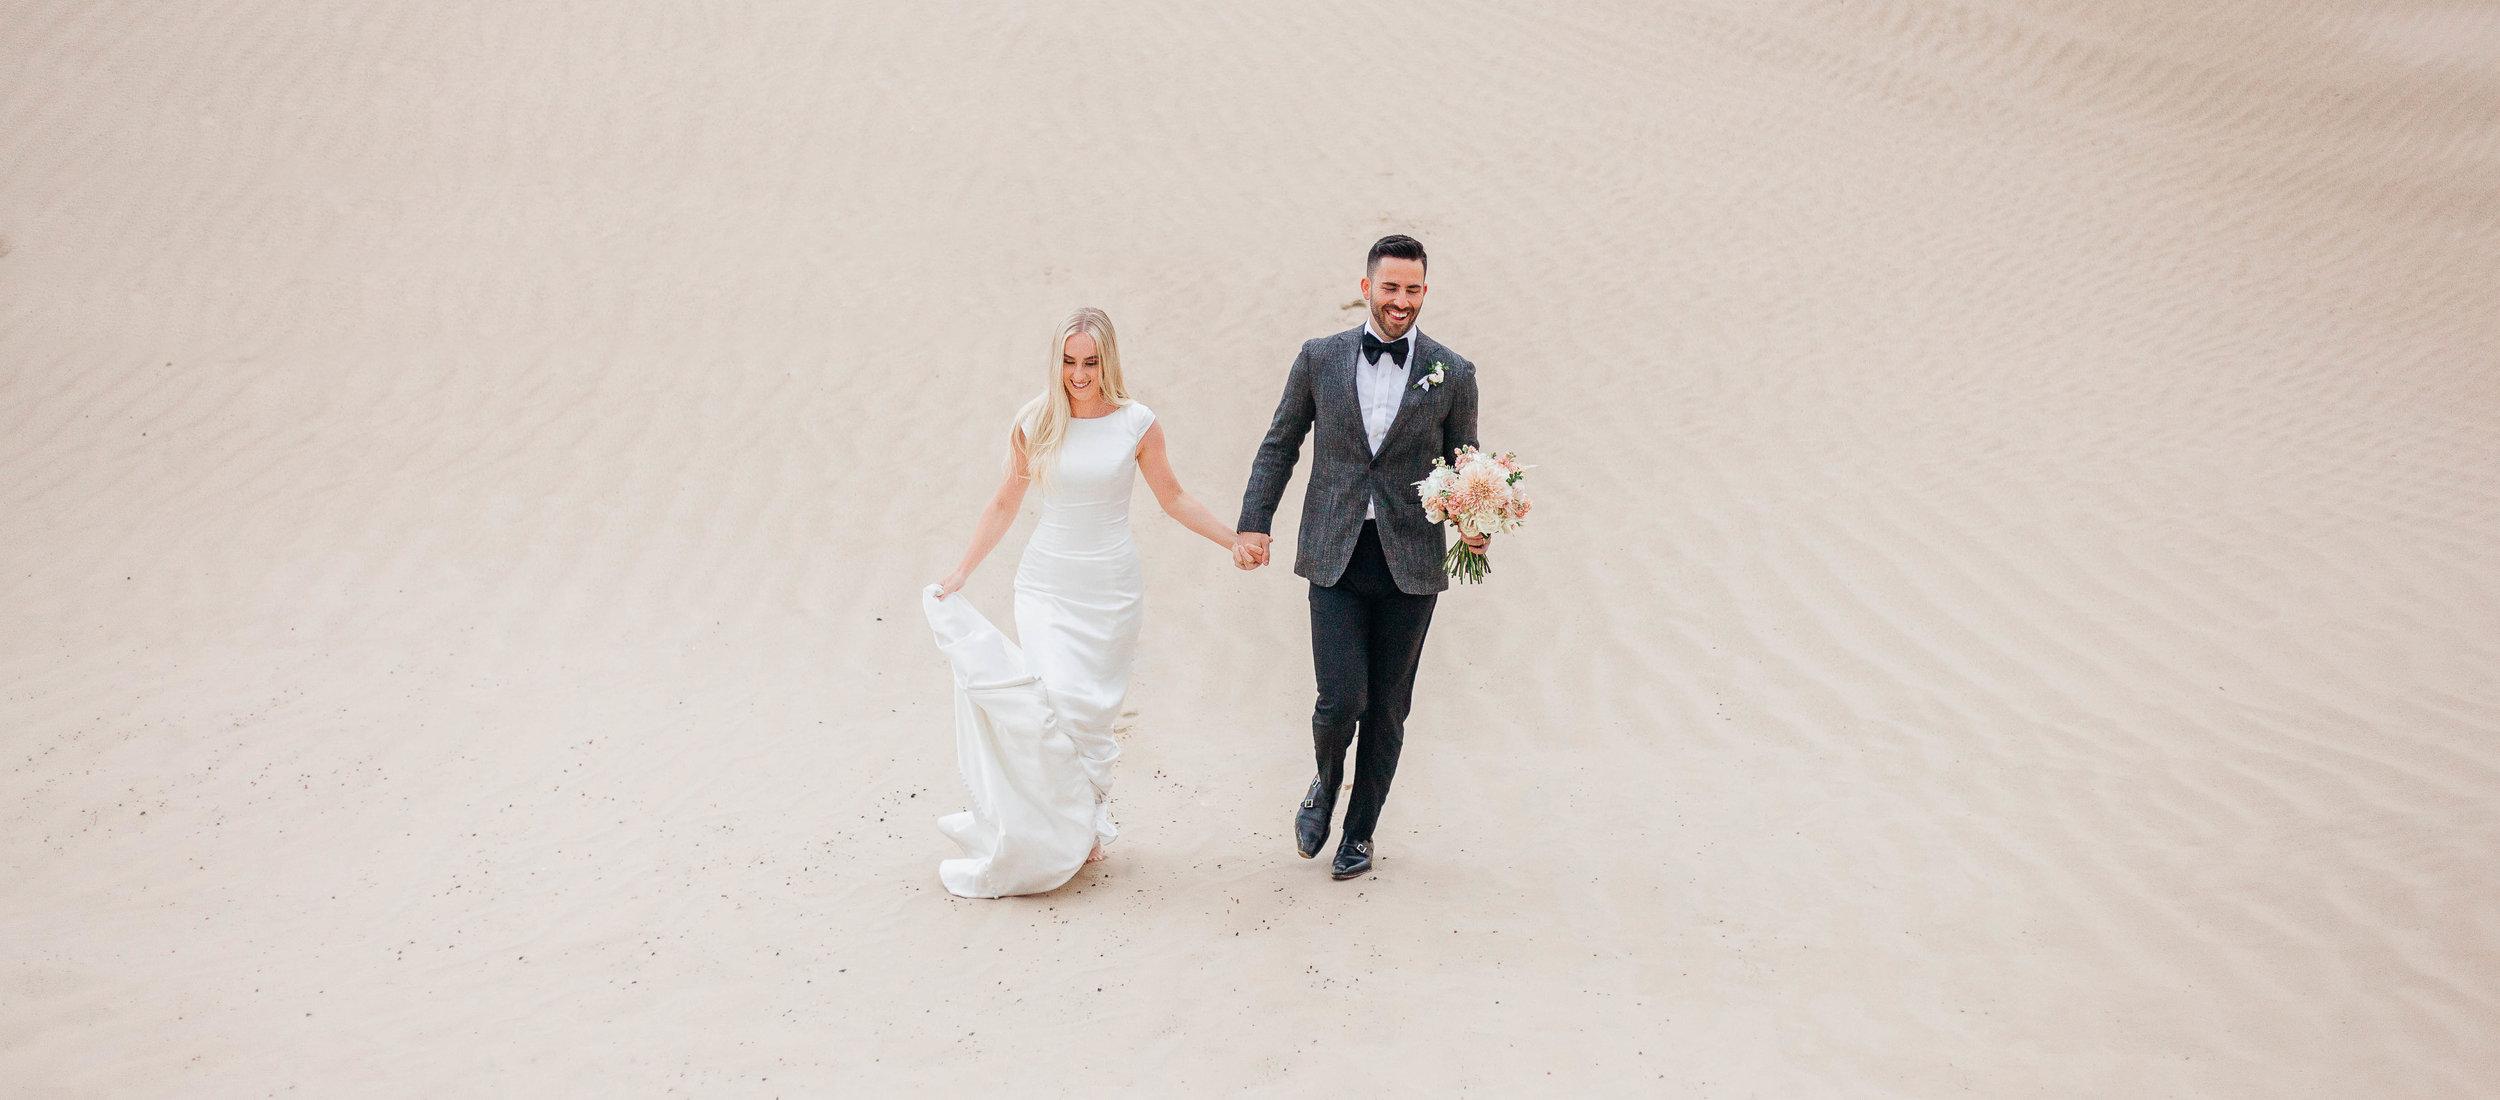 little-sahara-adventure-wedding-destiantion-wedding-photography-michael-cozzens-2.jpg